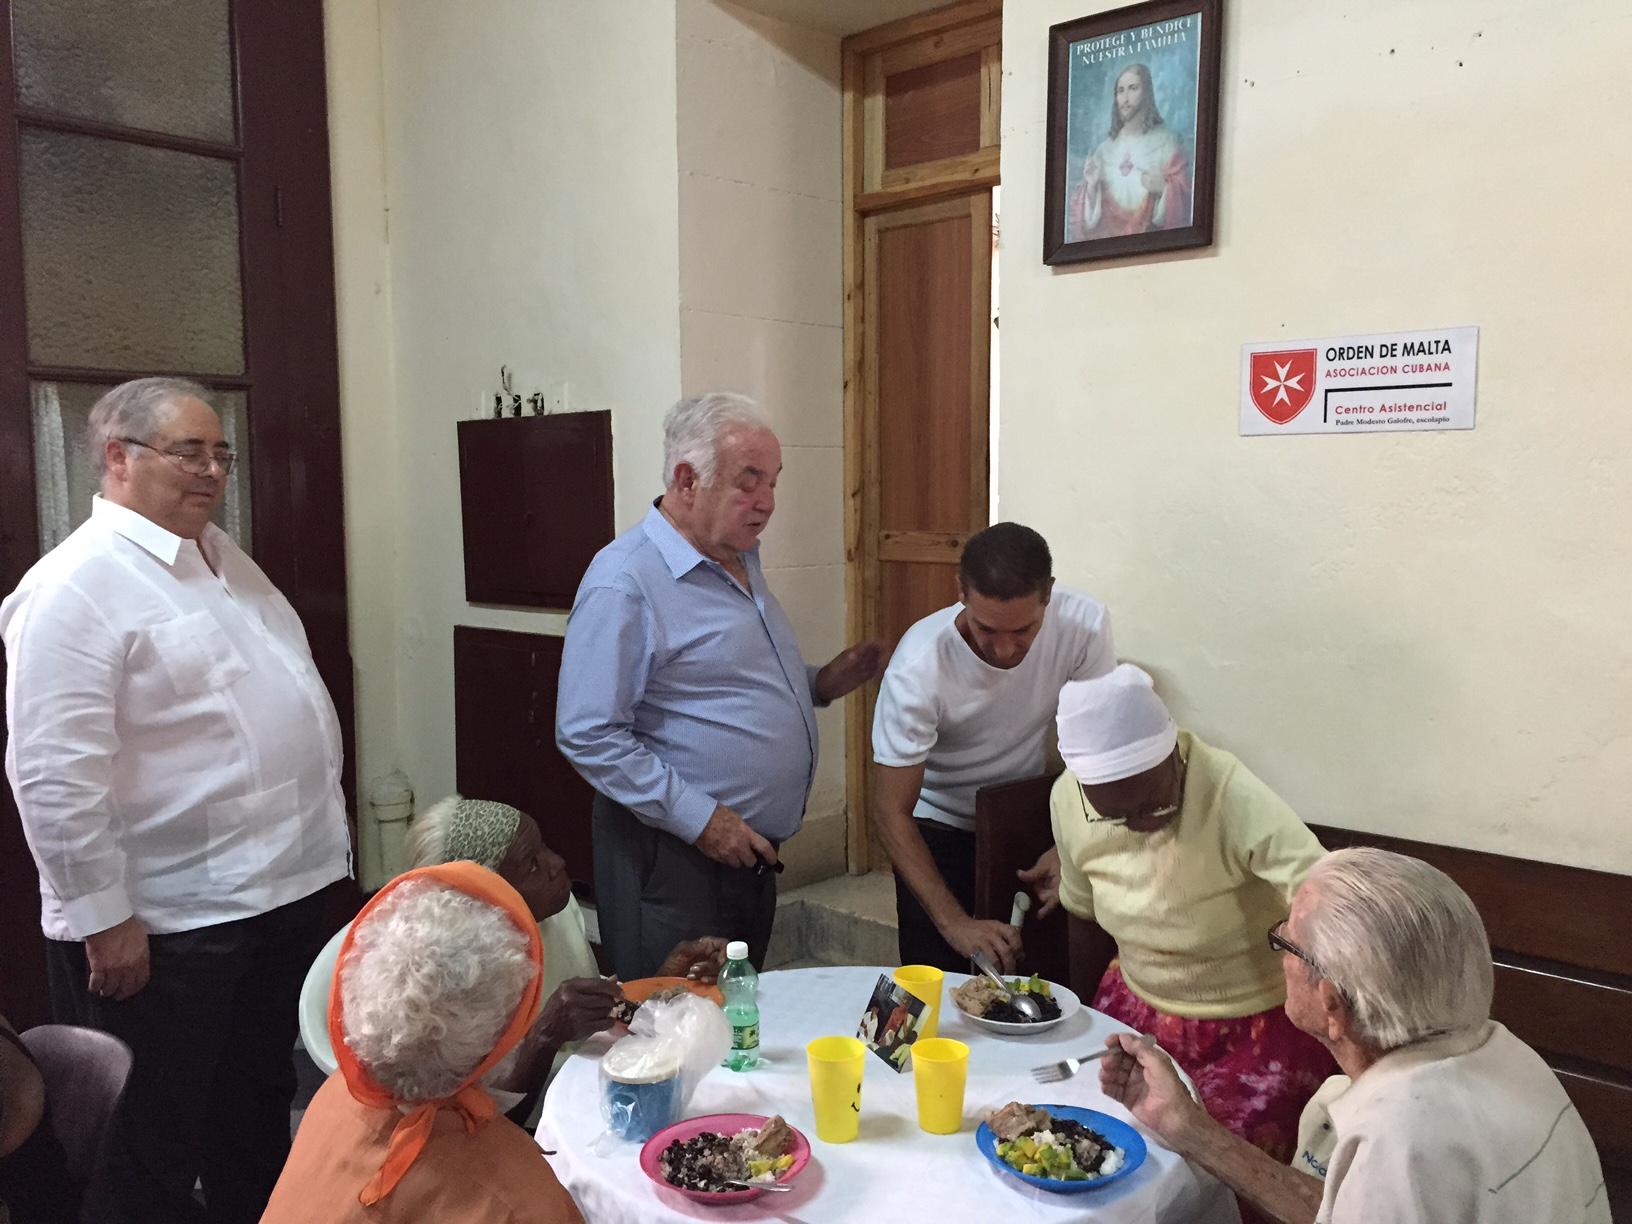 Comedores en Cuba: Support for the Elderly, Cuba, Cuban Association